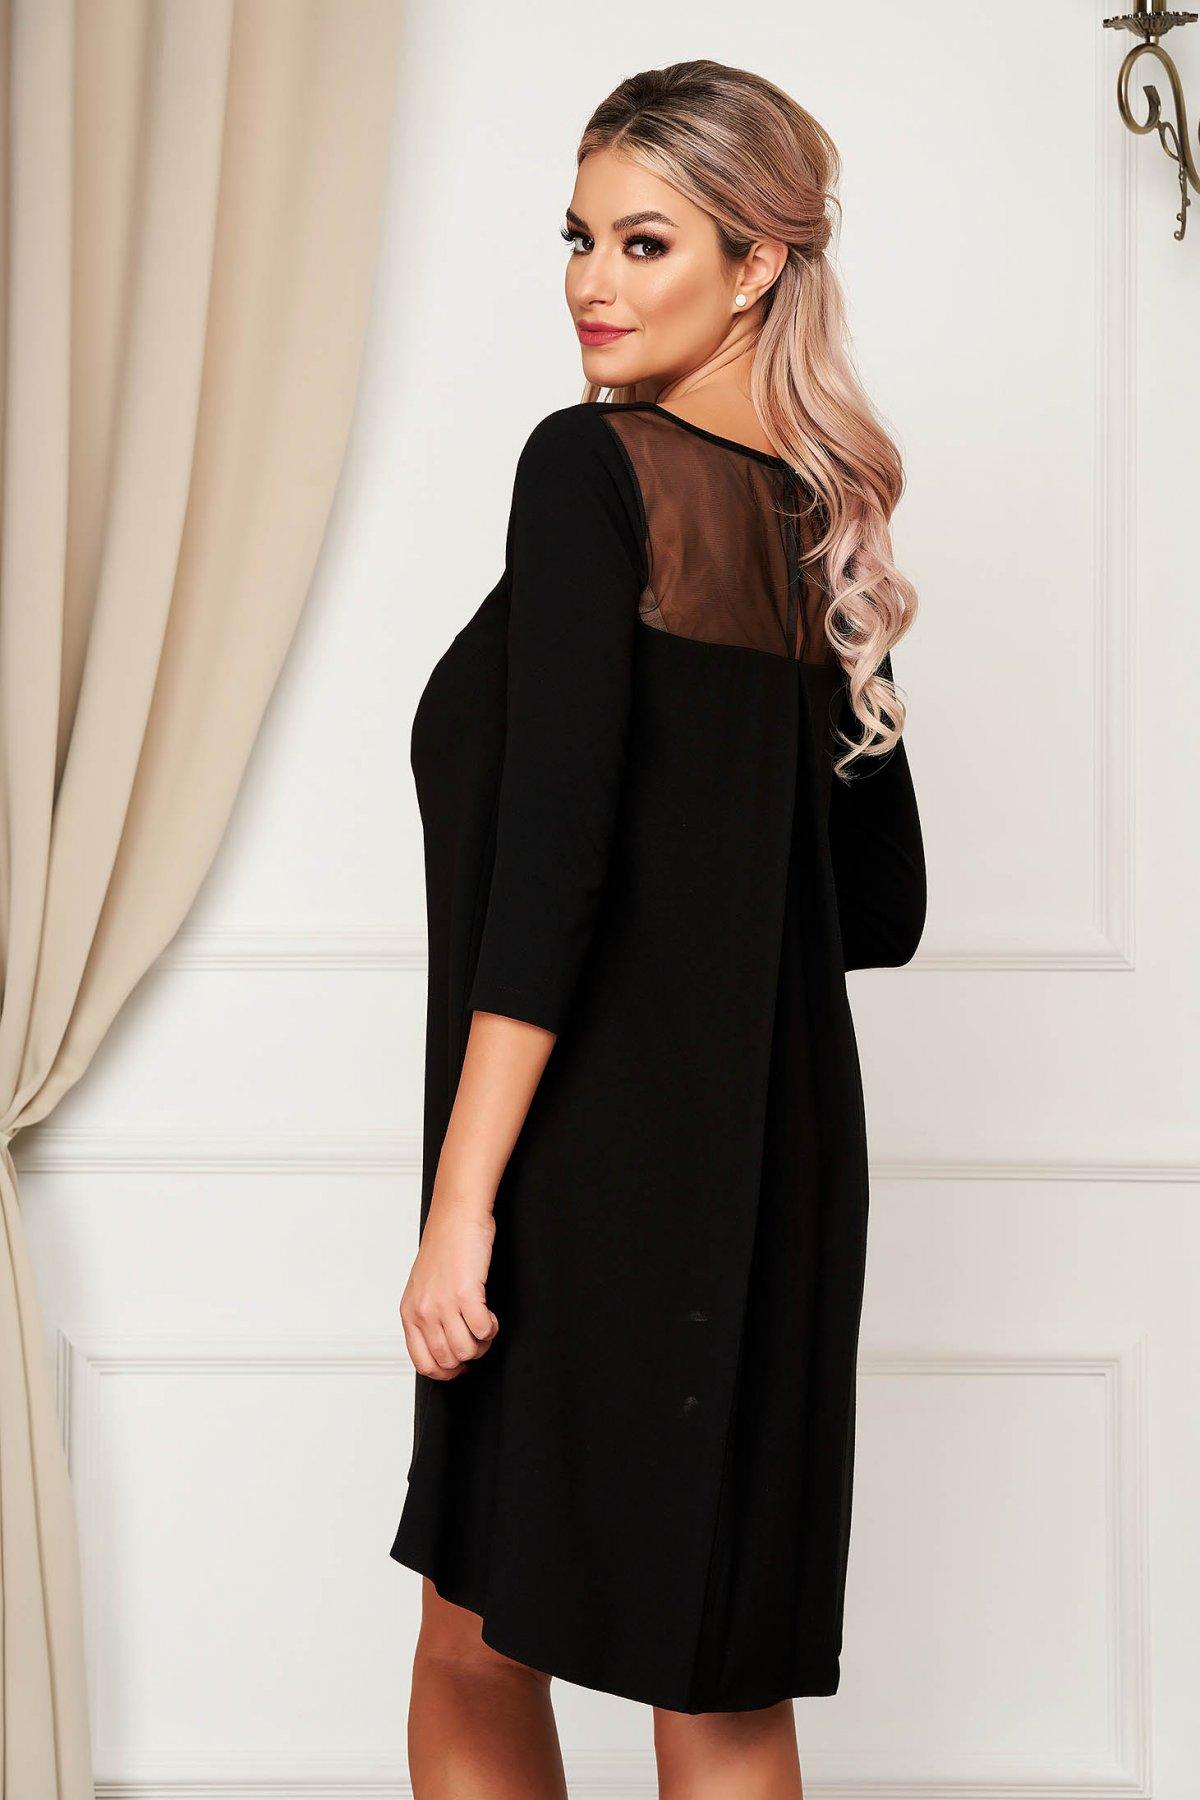 Rochie StarShinerS neagra eleganta cu croi larg cu maneca 3/4 din stofa neelastica